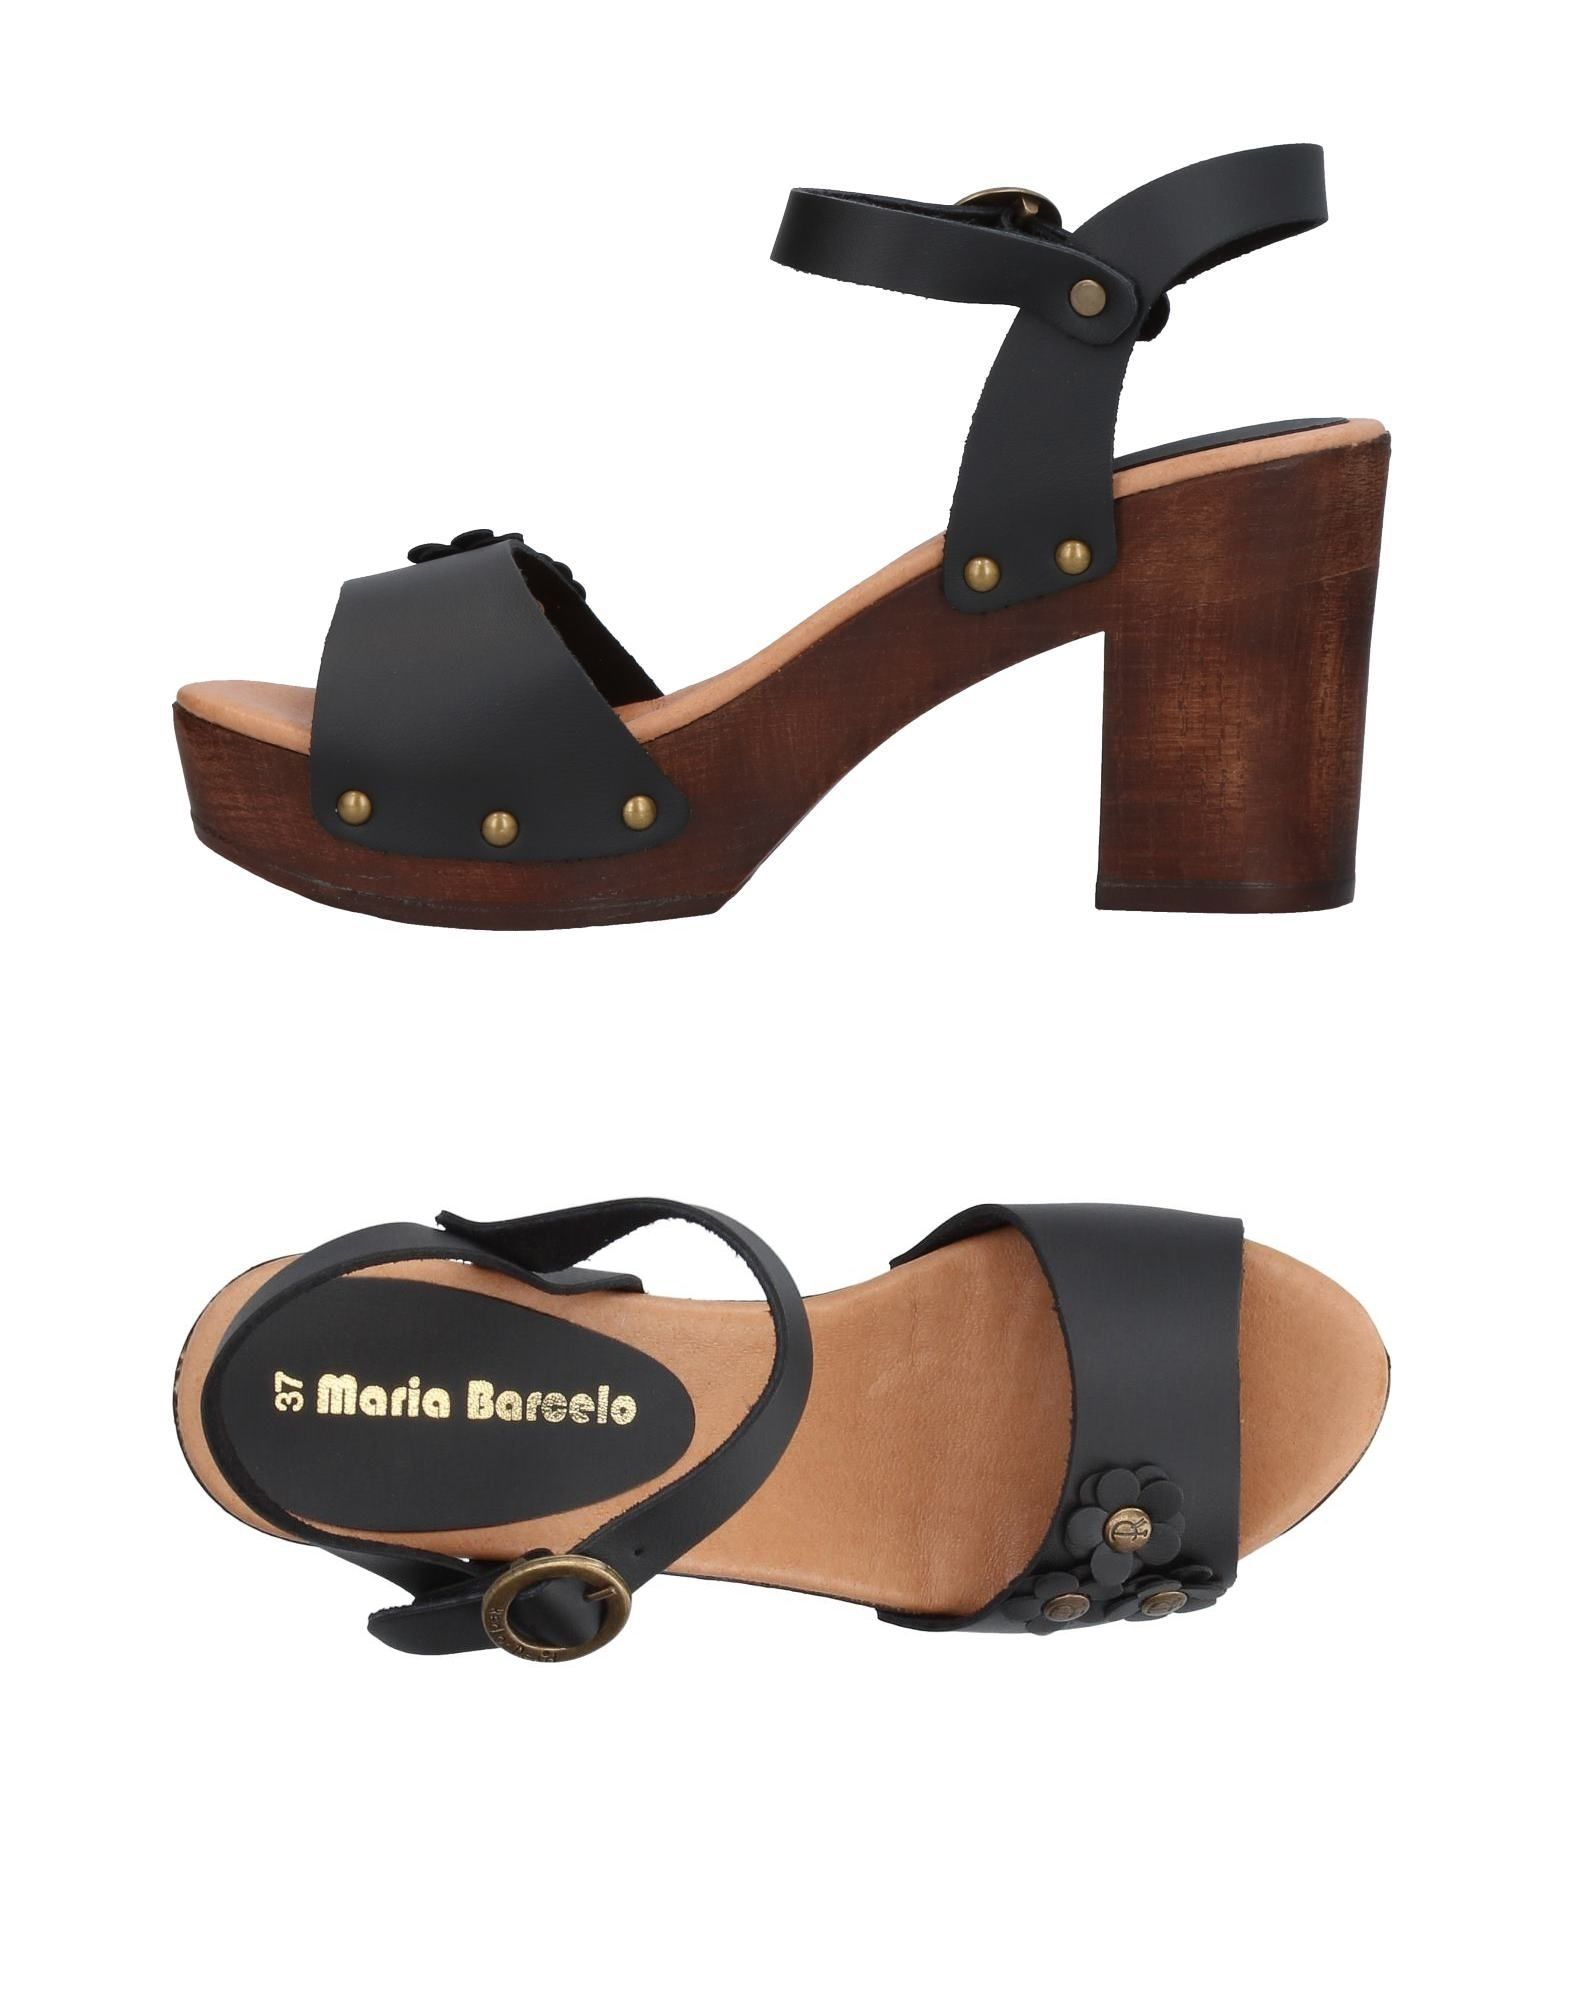 Sandales Maria Barcelo Femme - Sandales Maria Barcelo sur